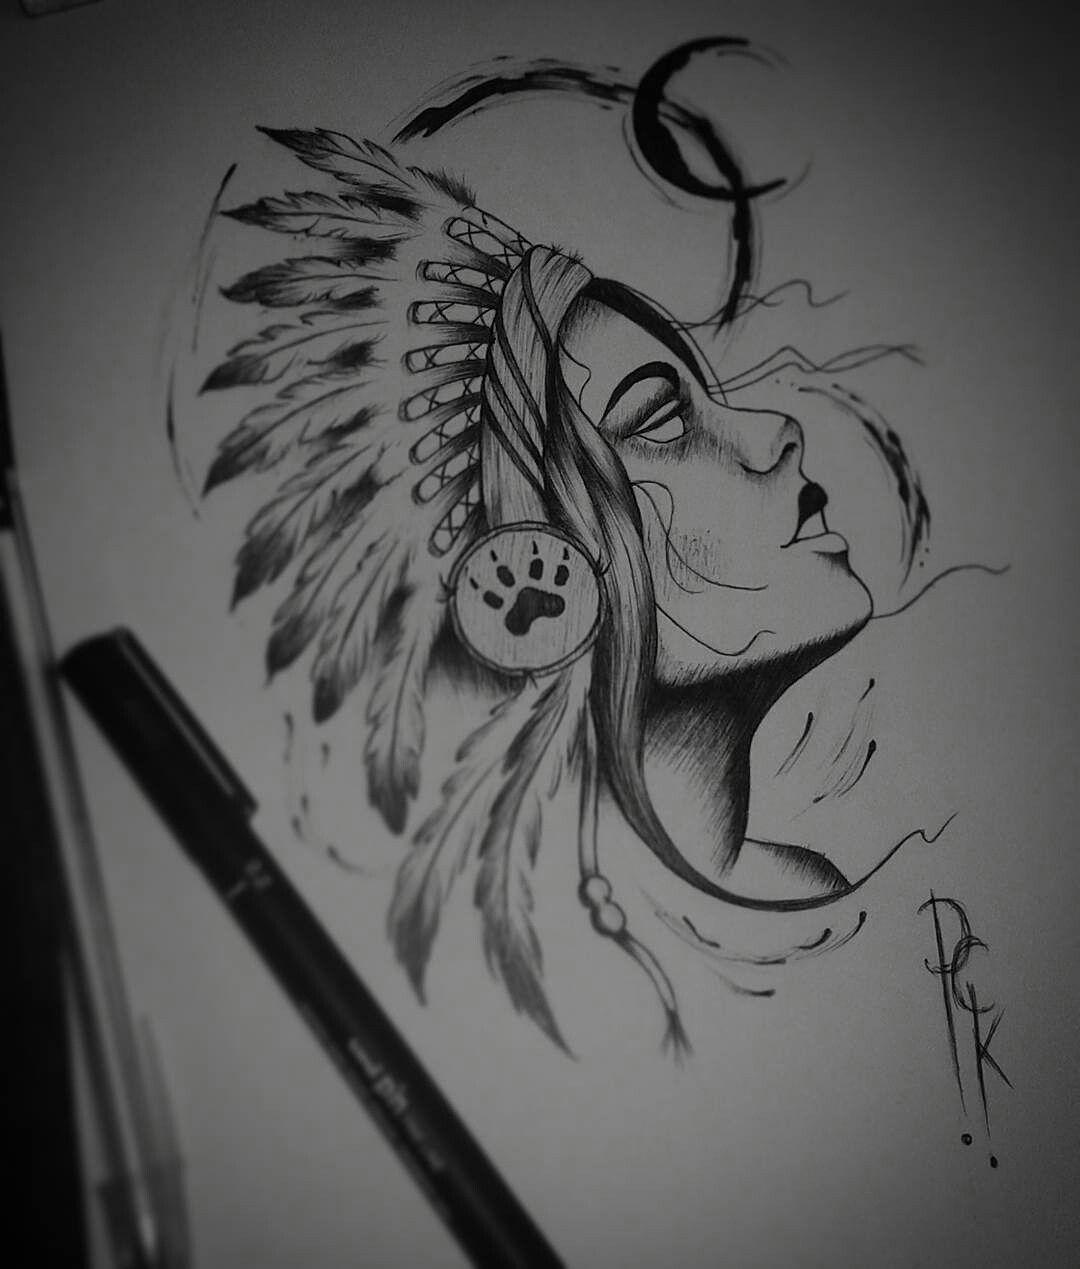 Pin De Jandrito87 Martinez Em Tatuajes Desenho Tatuagem